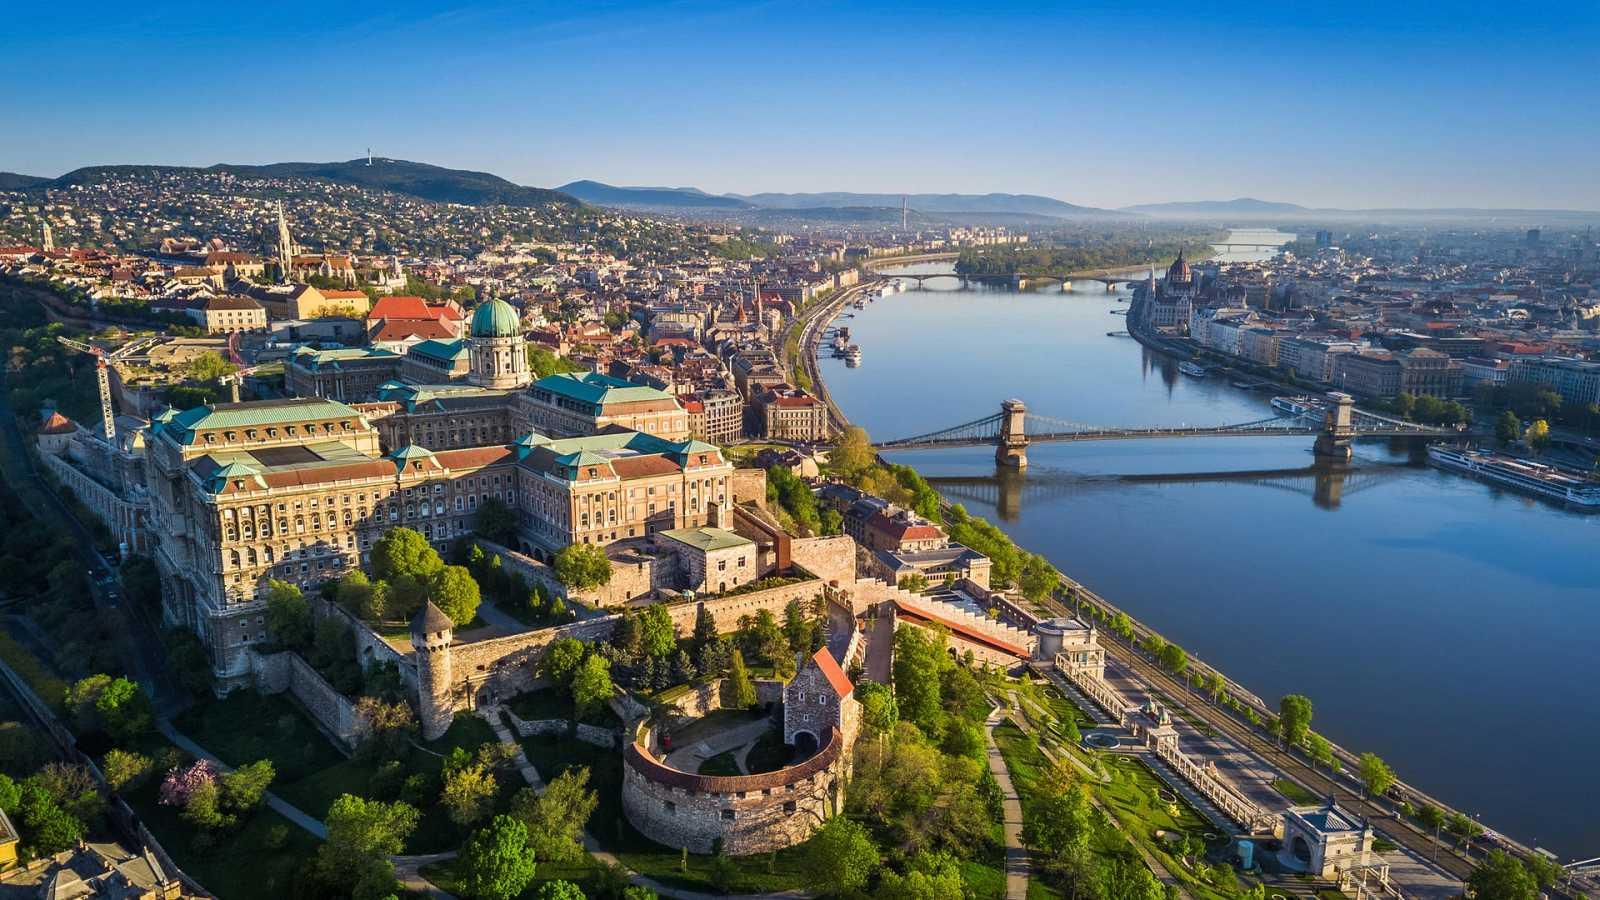 Visítame en un día - Episodio 10: Budapest - ver ahora